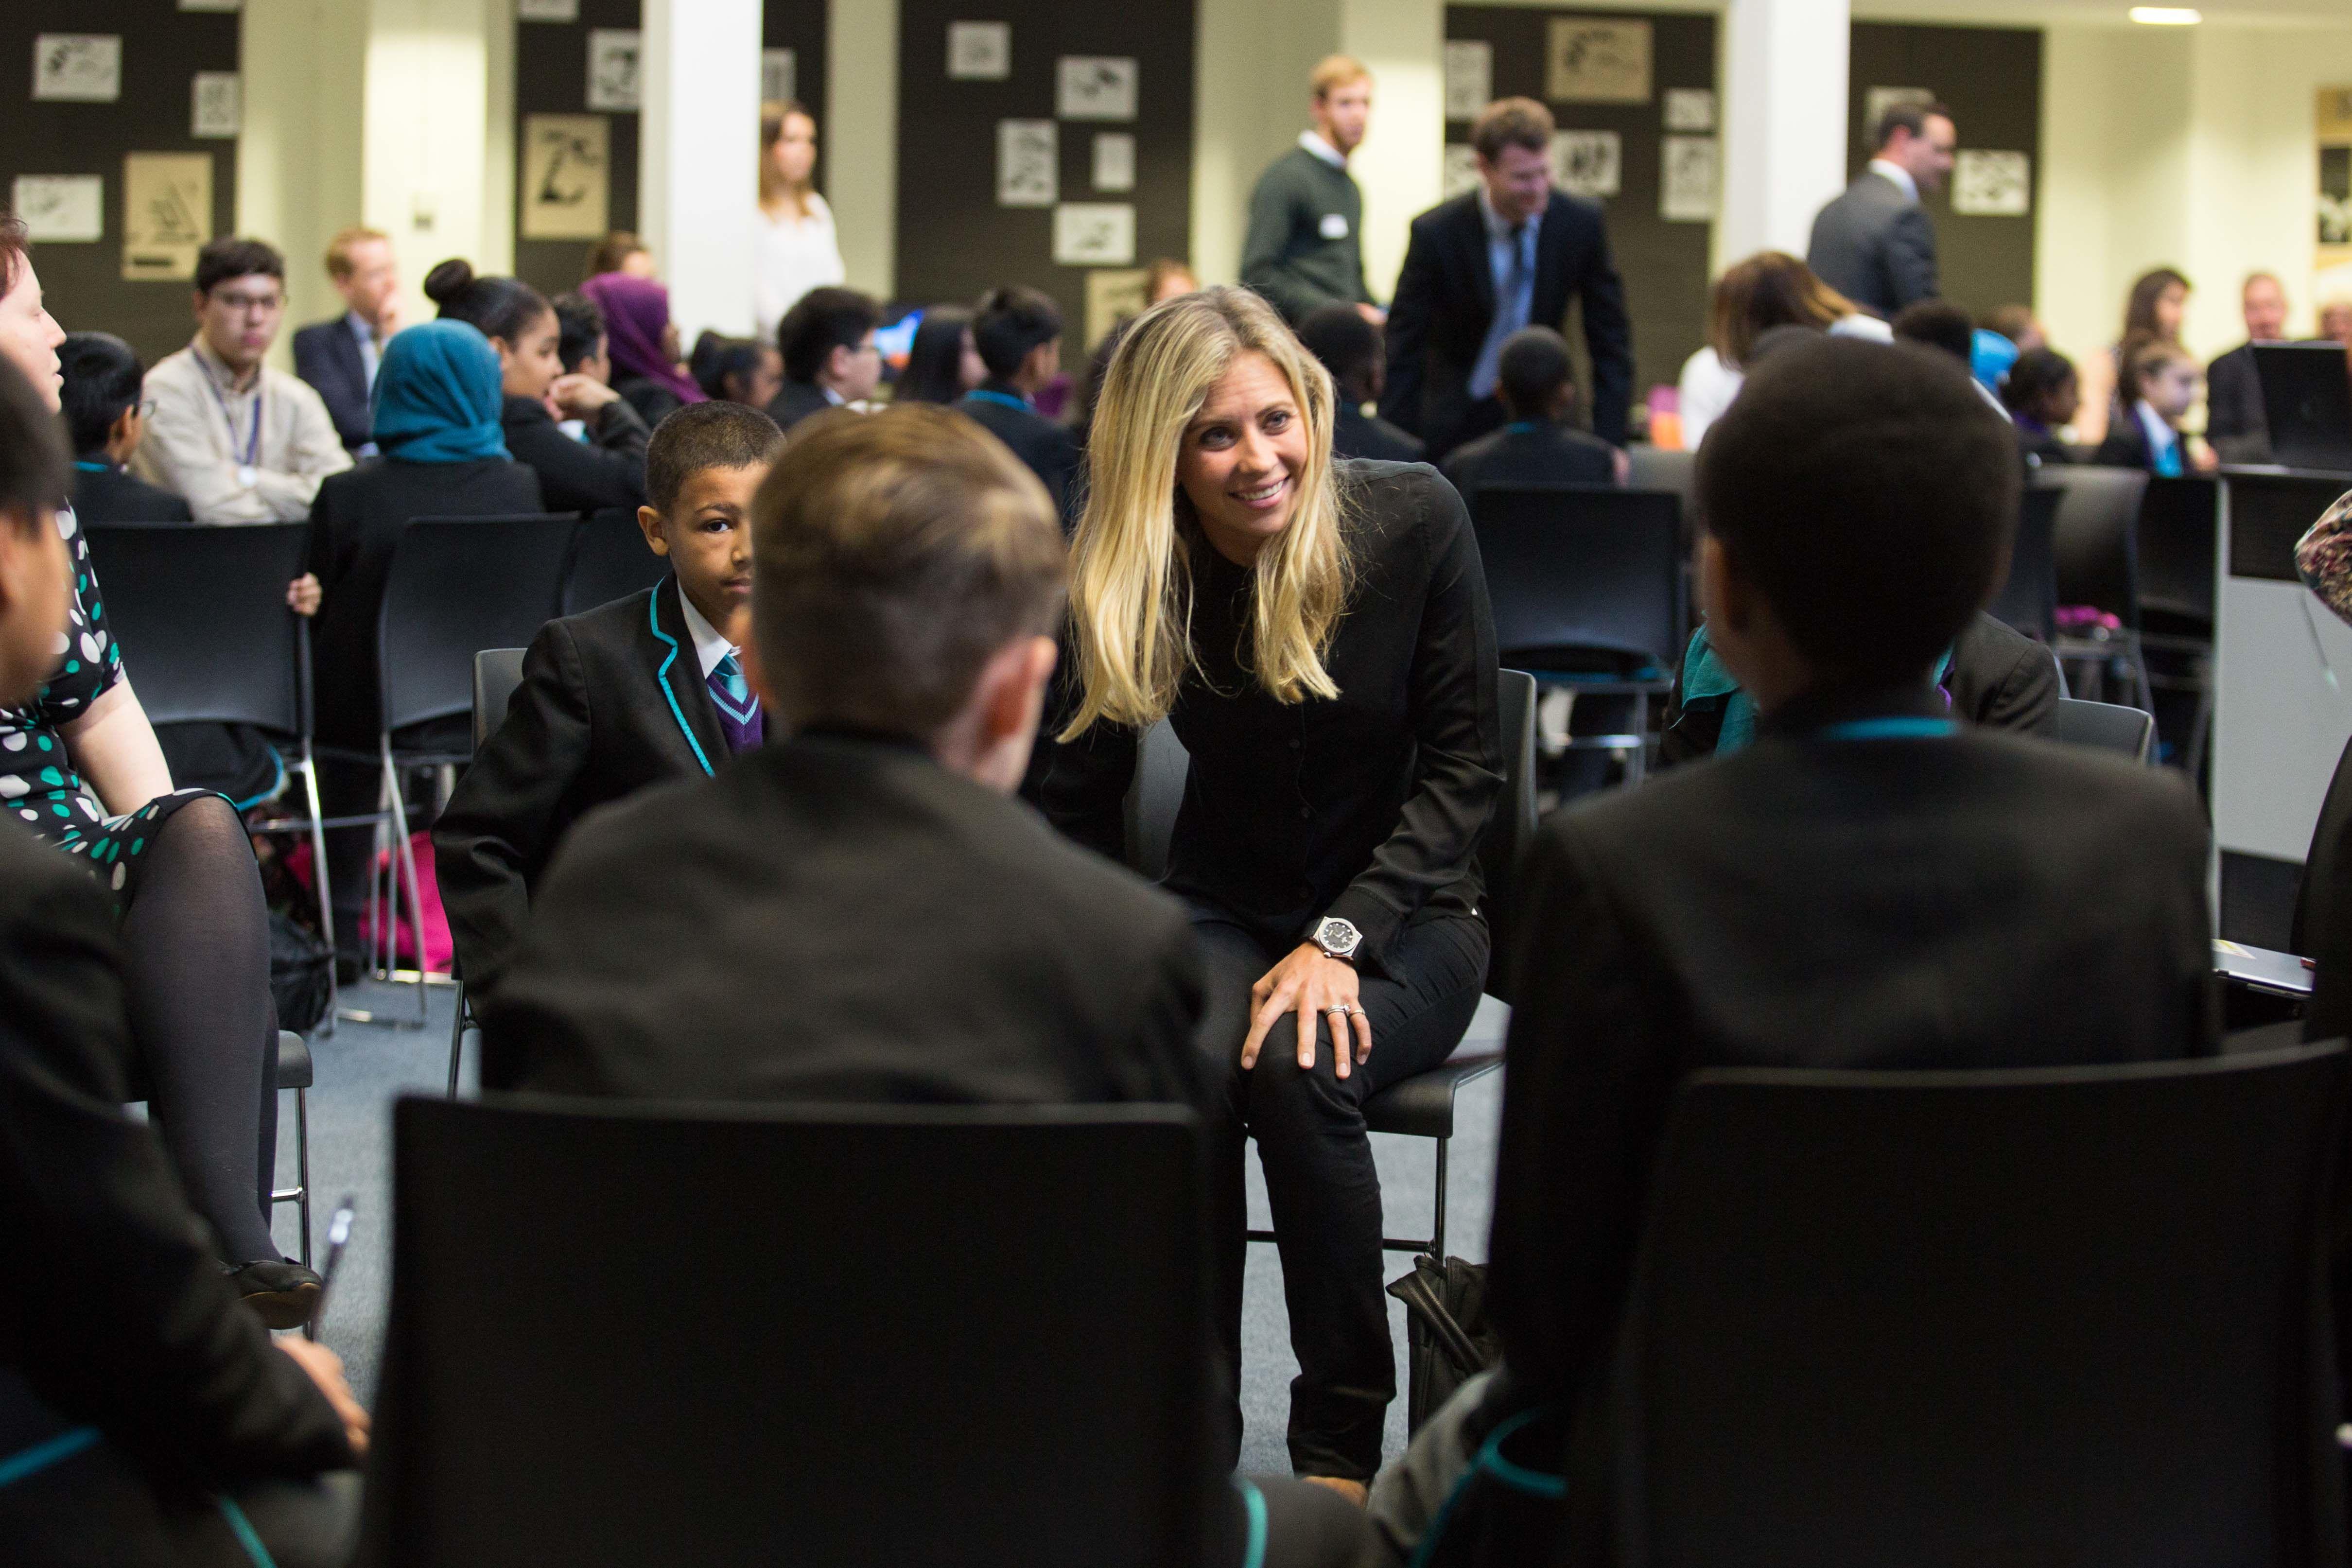 Holly Branson, Big Change, school visit 2016, Adam Slama